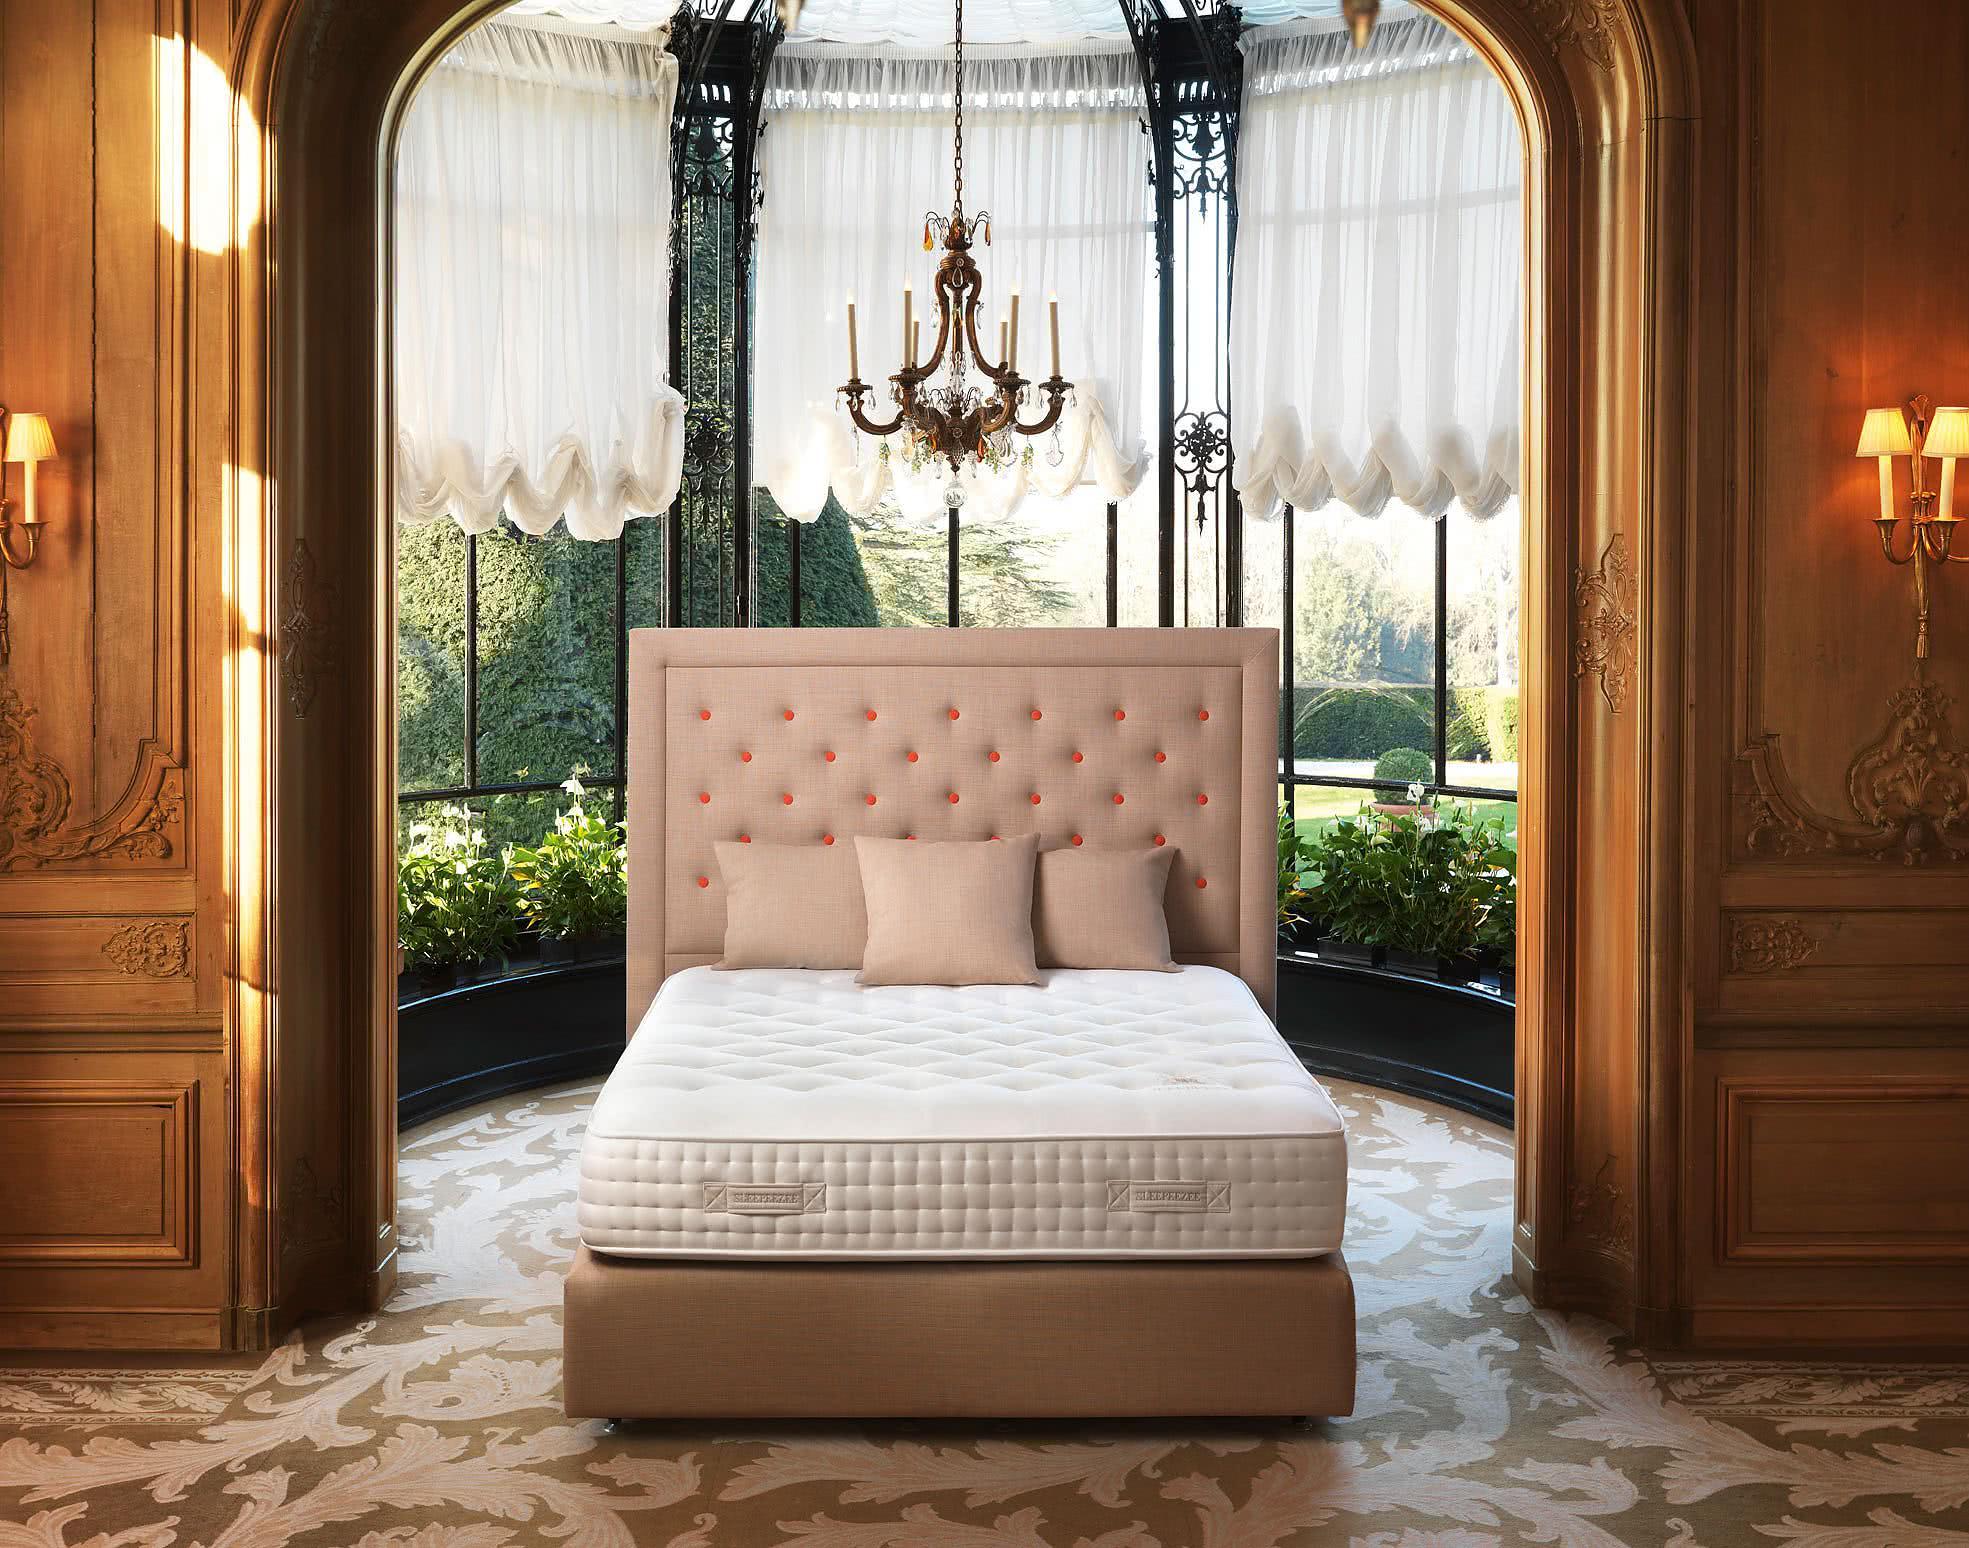 Матрас Sleepeezee Luxury Crystal Palace